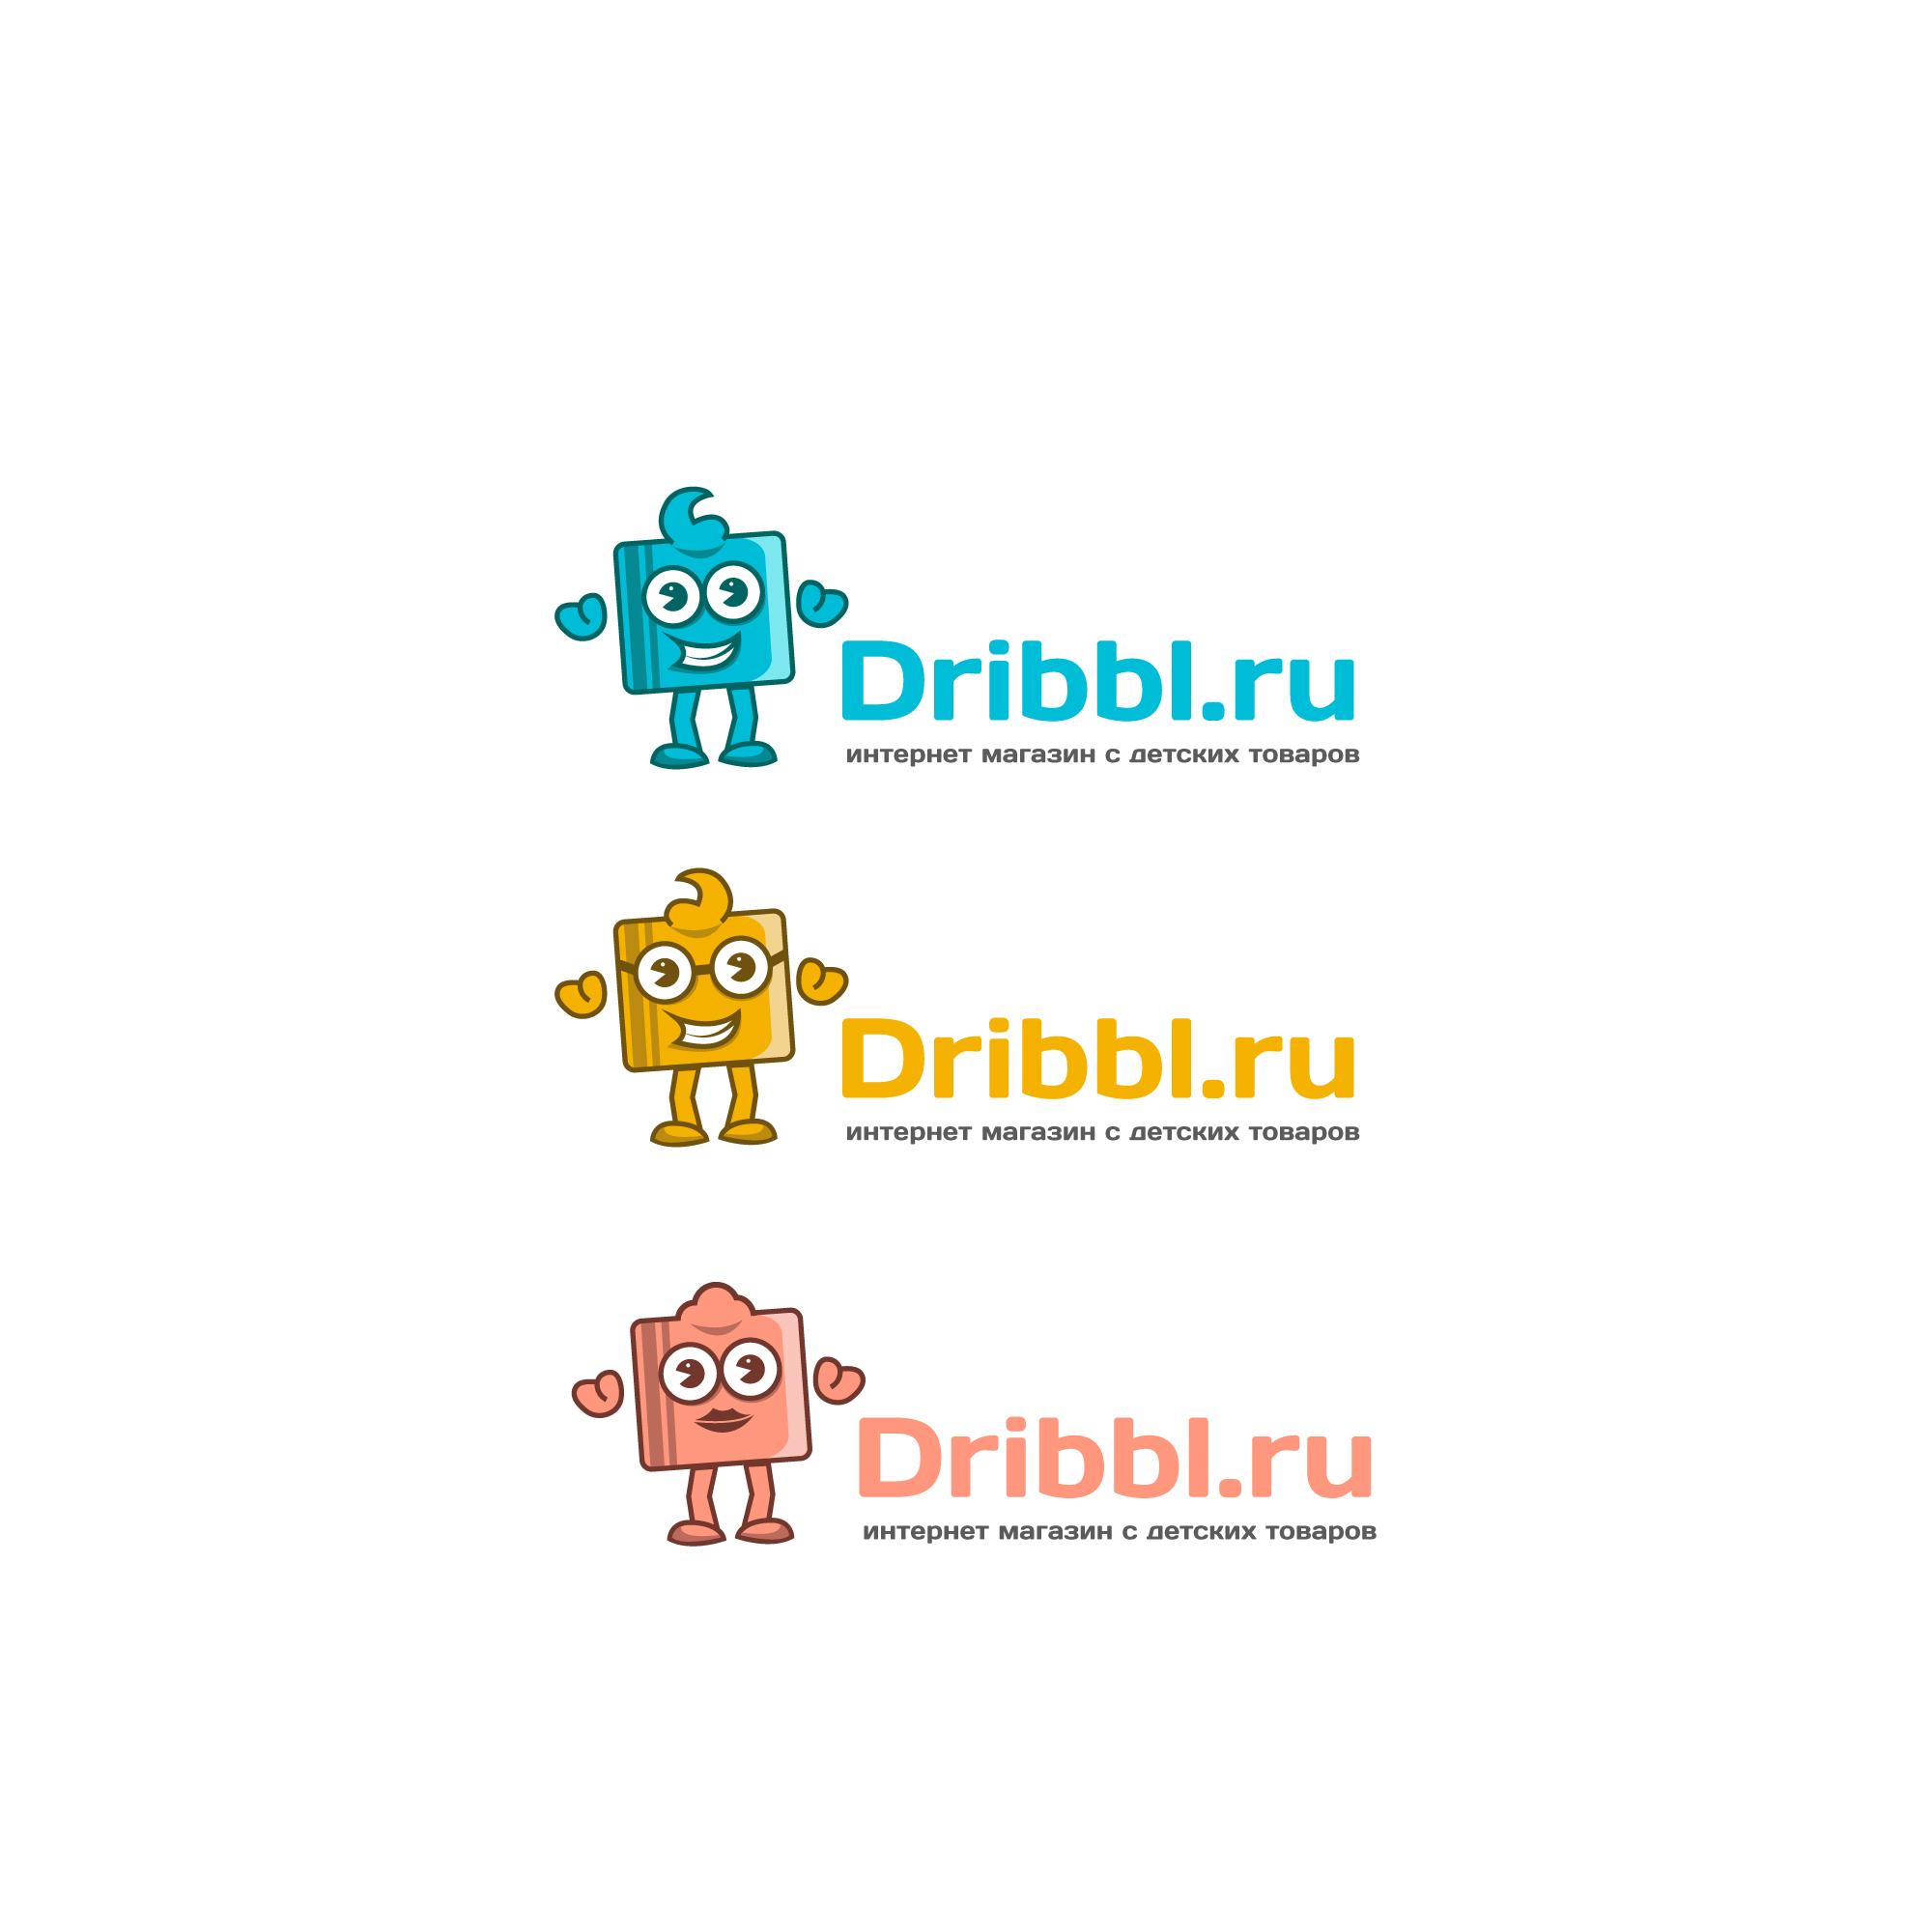 Разработка логотипа для сайта Dribbl.ru фото f_9065a9d4991b34c3.jpg